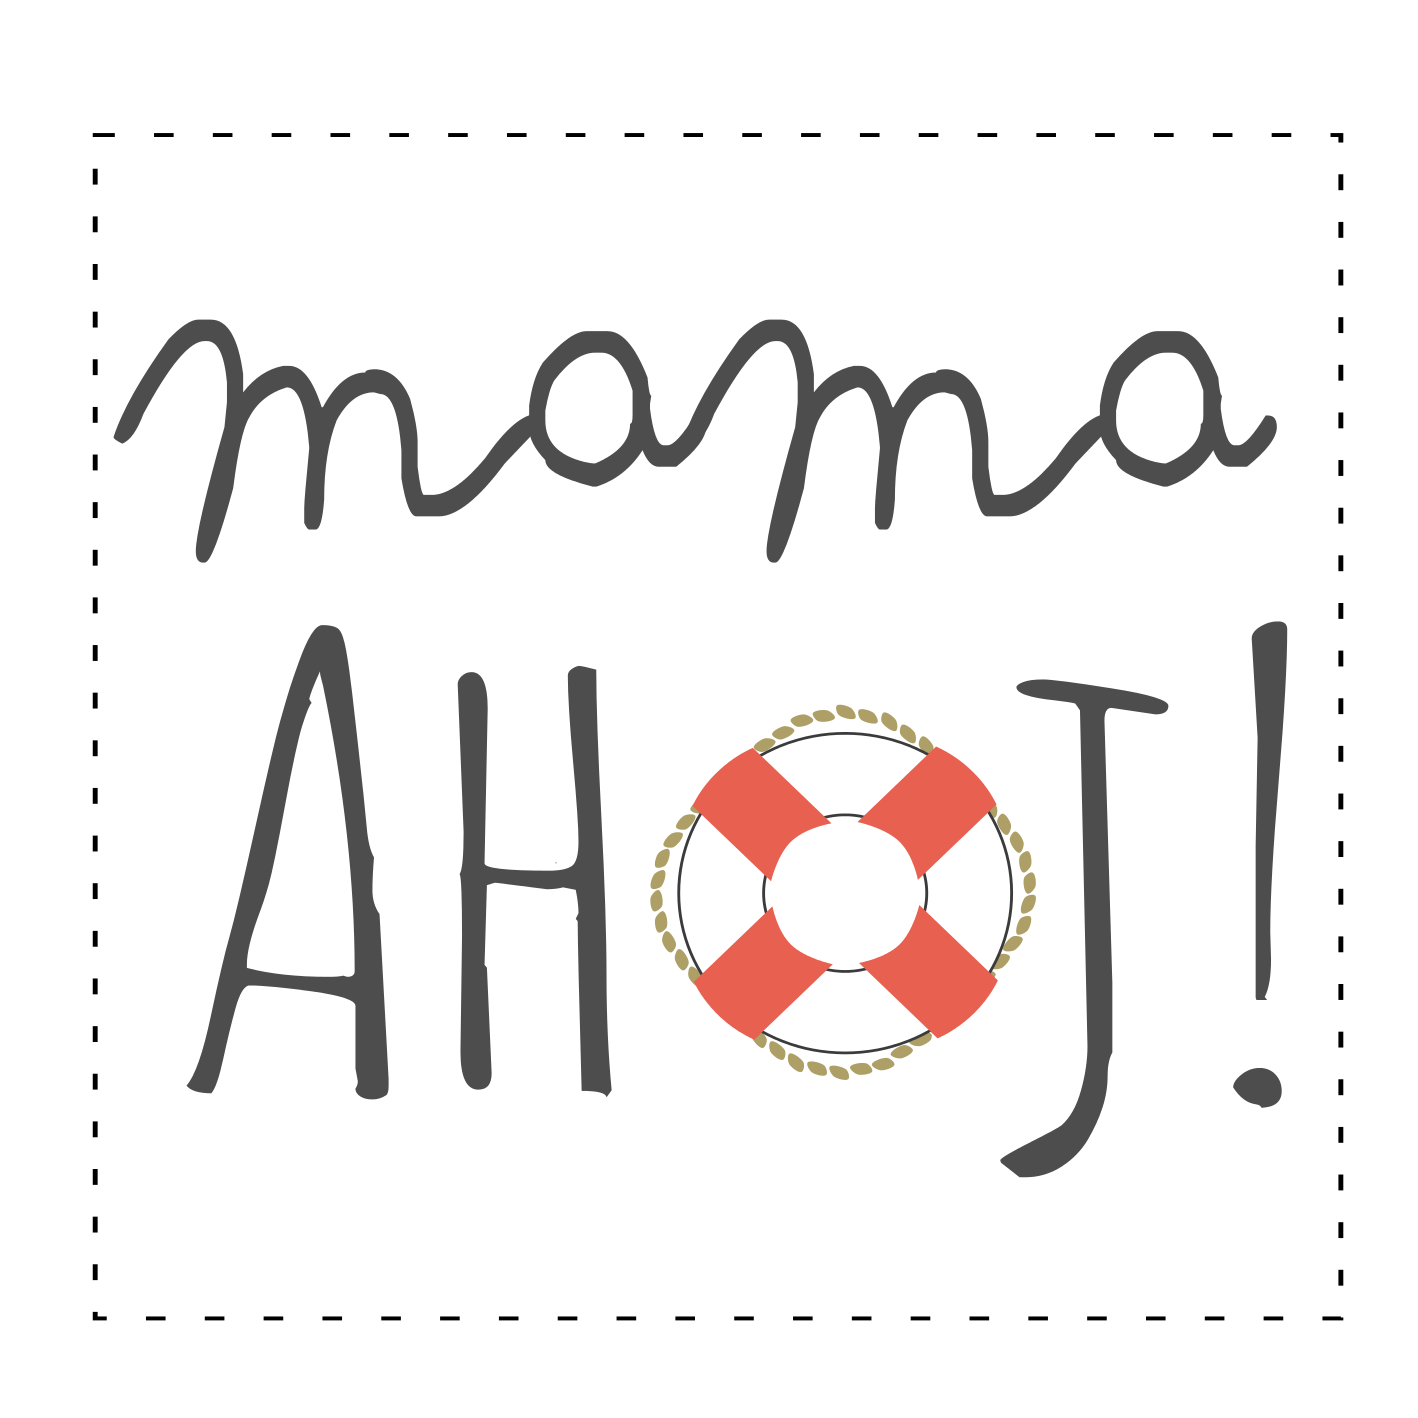 ahoj mama - logo